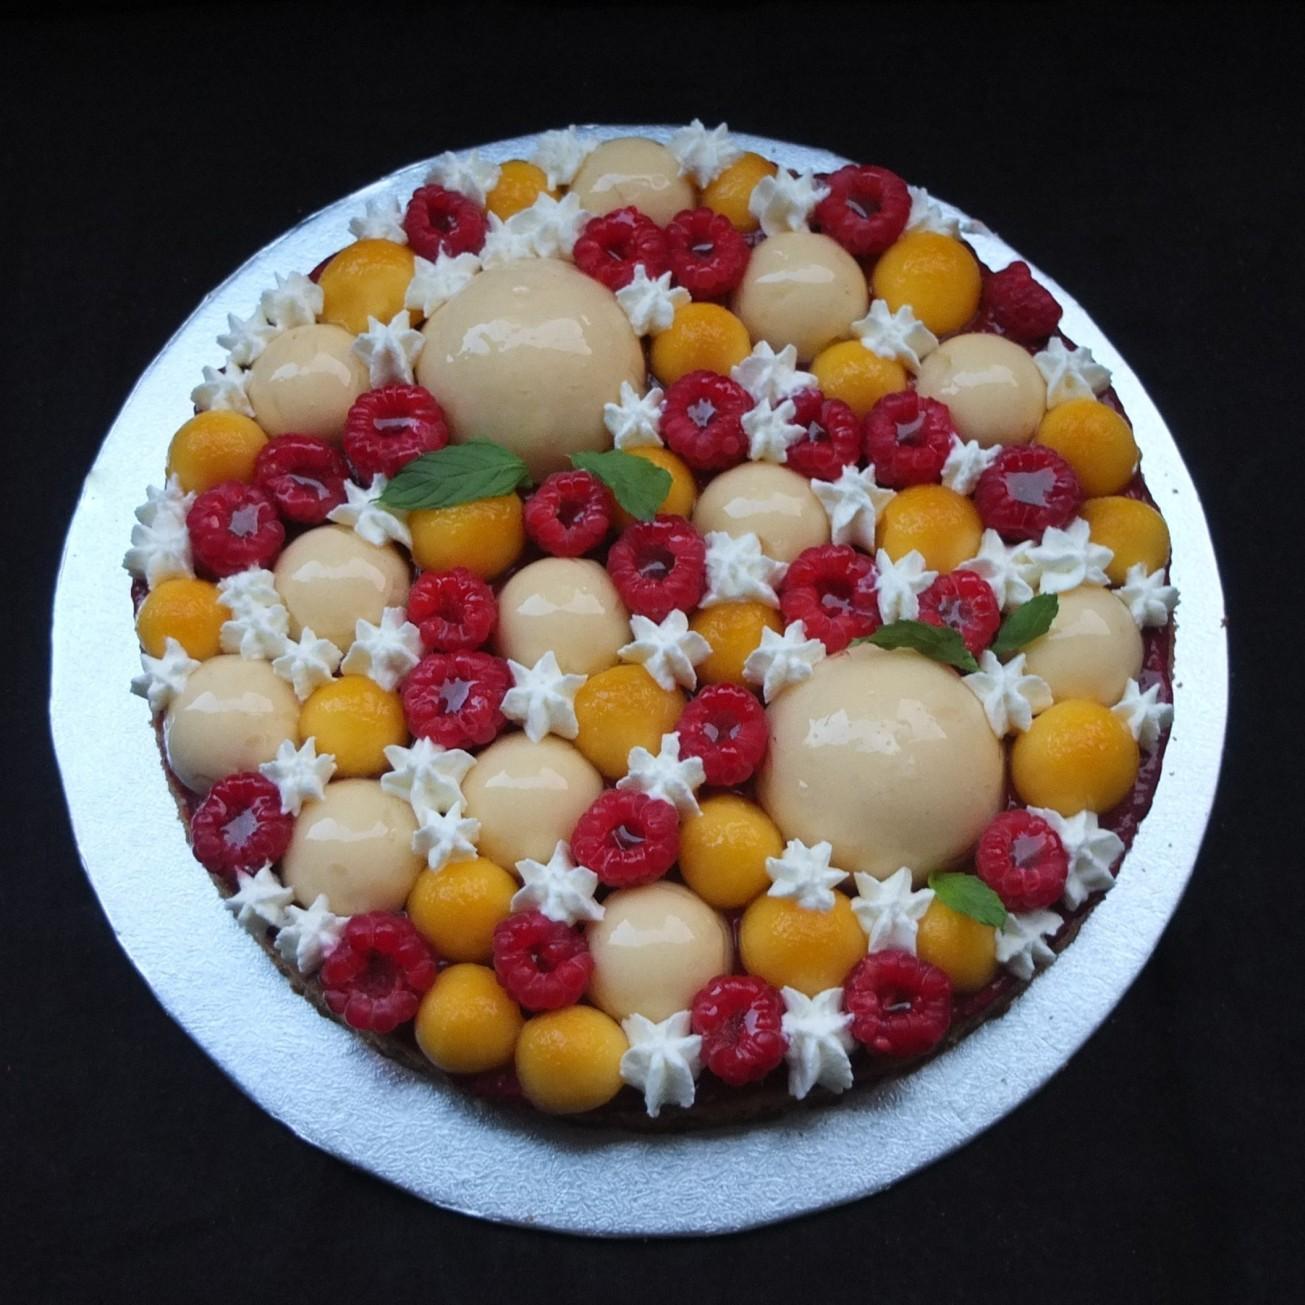 Raspberry, lemon and peach Fantastik tart